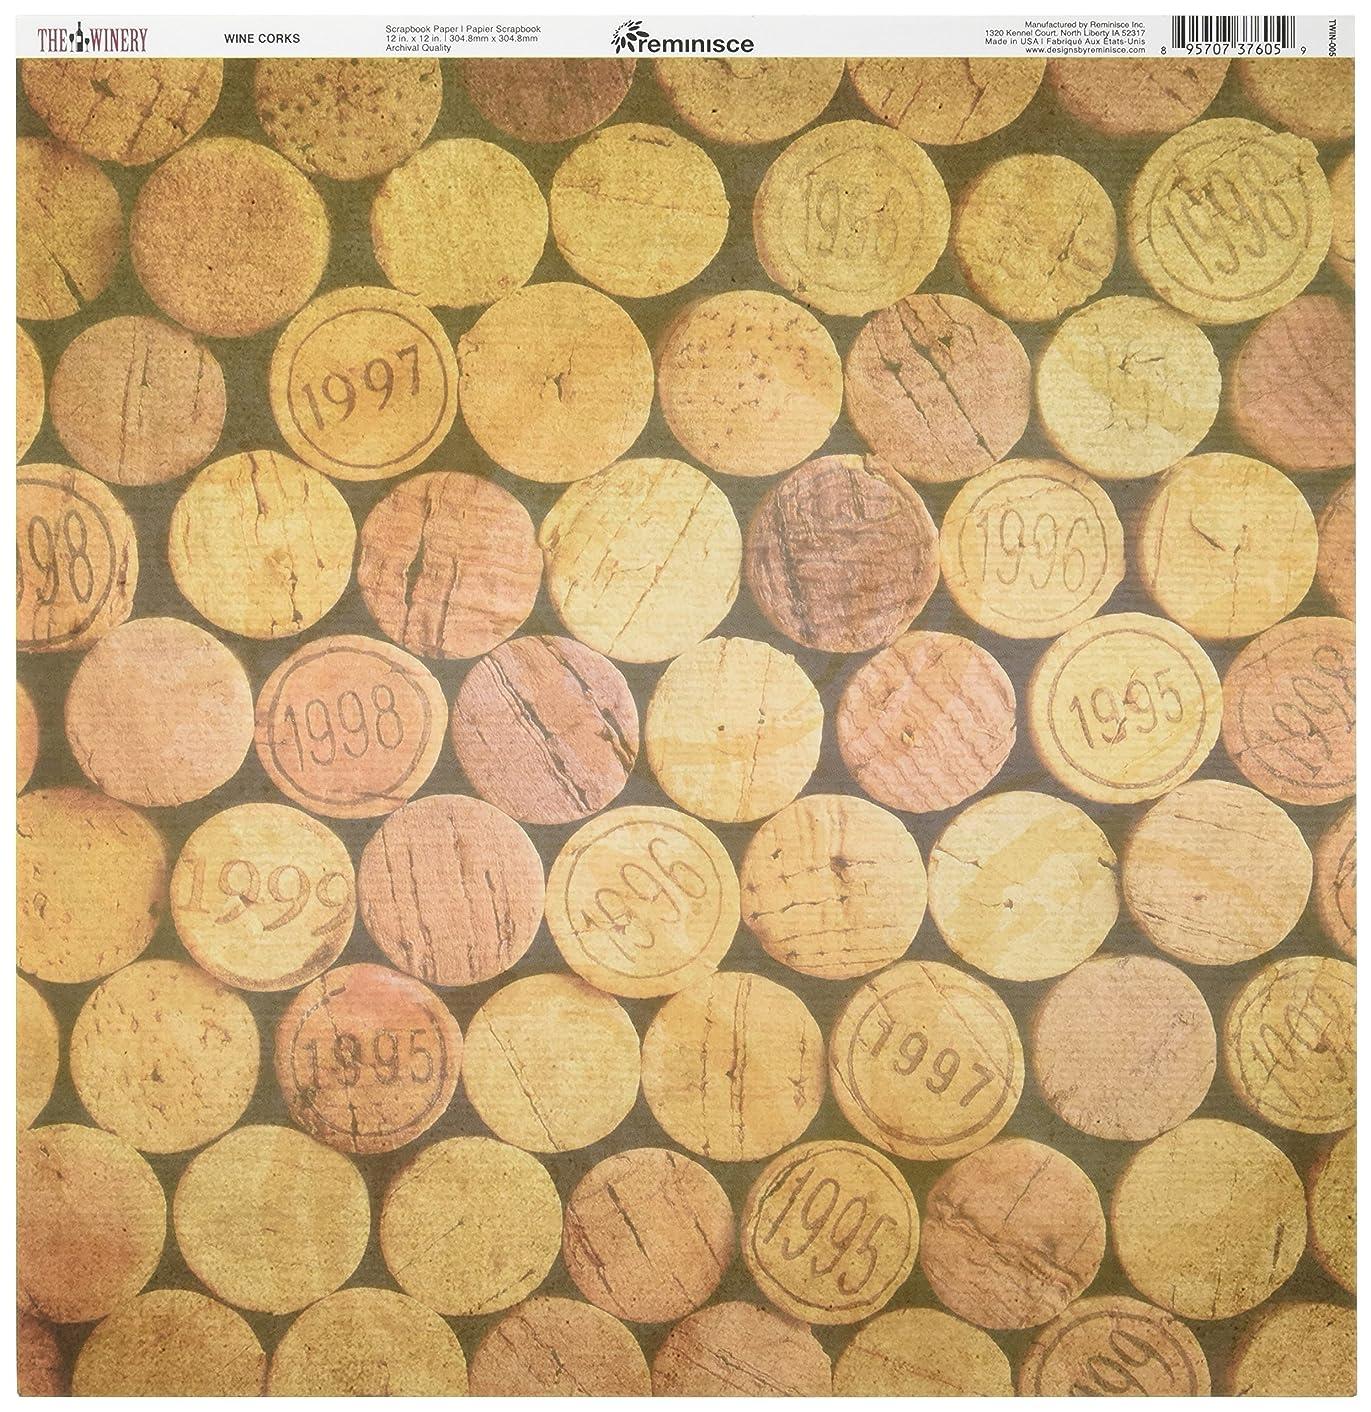 Reminisce TWIN-005 25 Sheet Wine Corks Winery Double-Sided Cardstock, 12